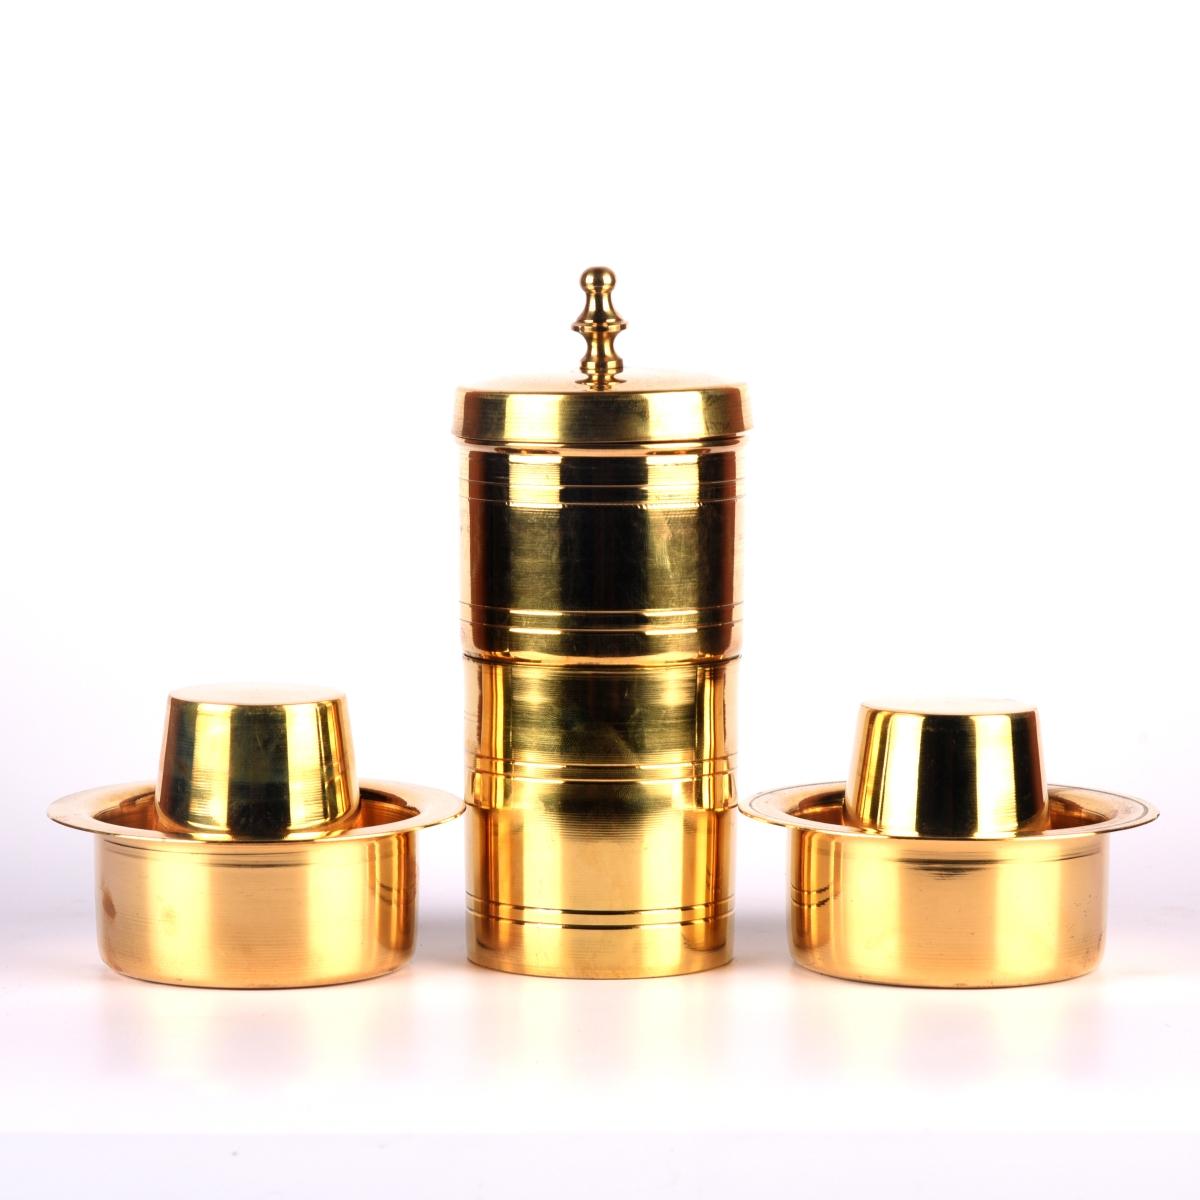 brass coffee filter